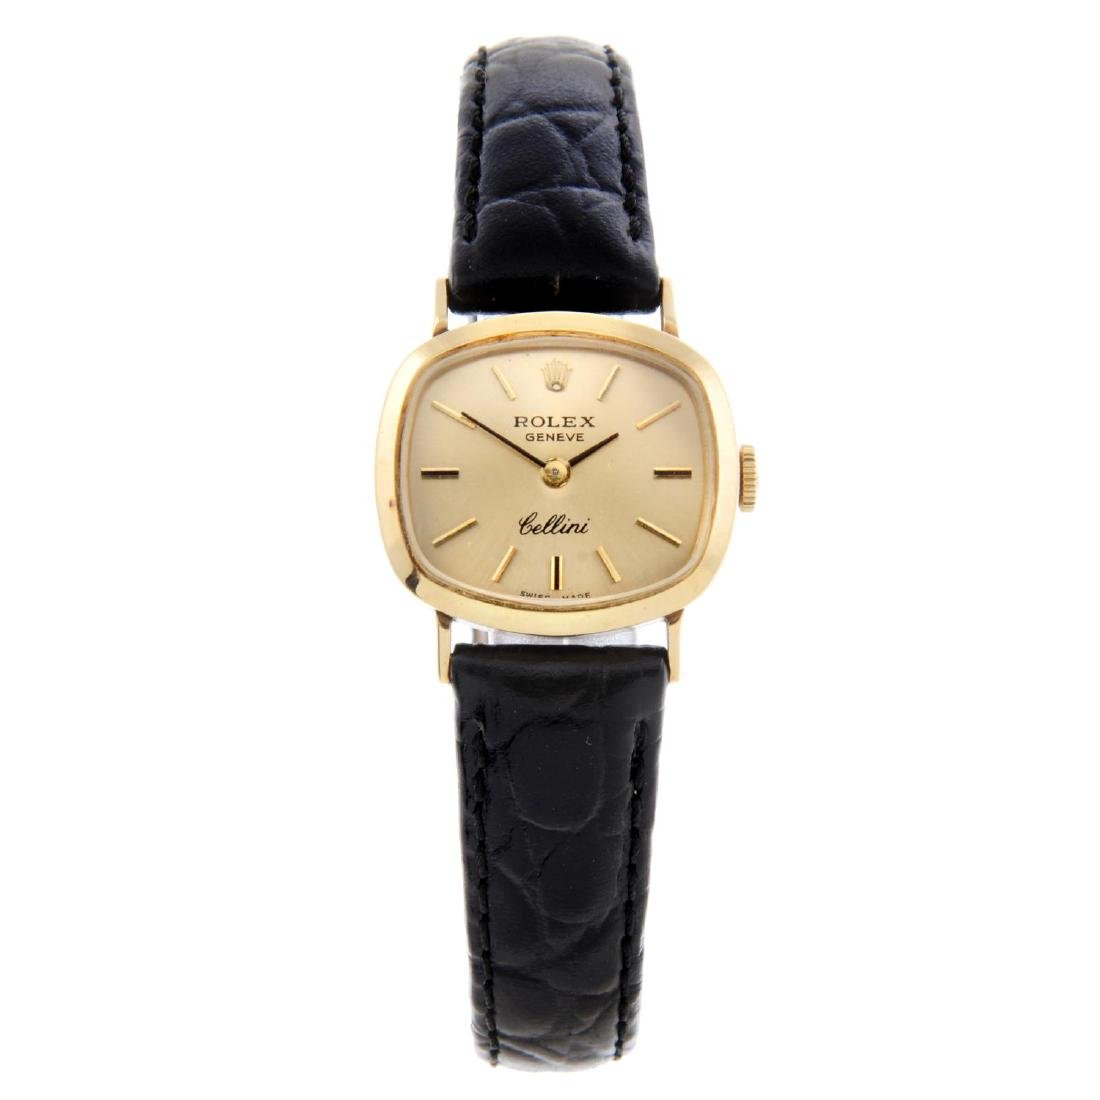 ROLEX - a lady's Cellini wrist watch. Circa 1971.